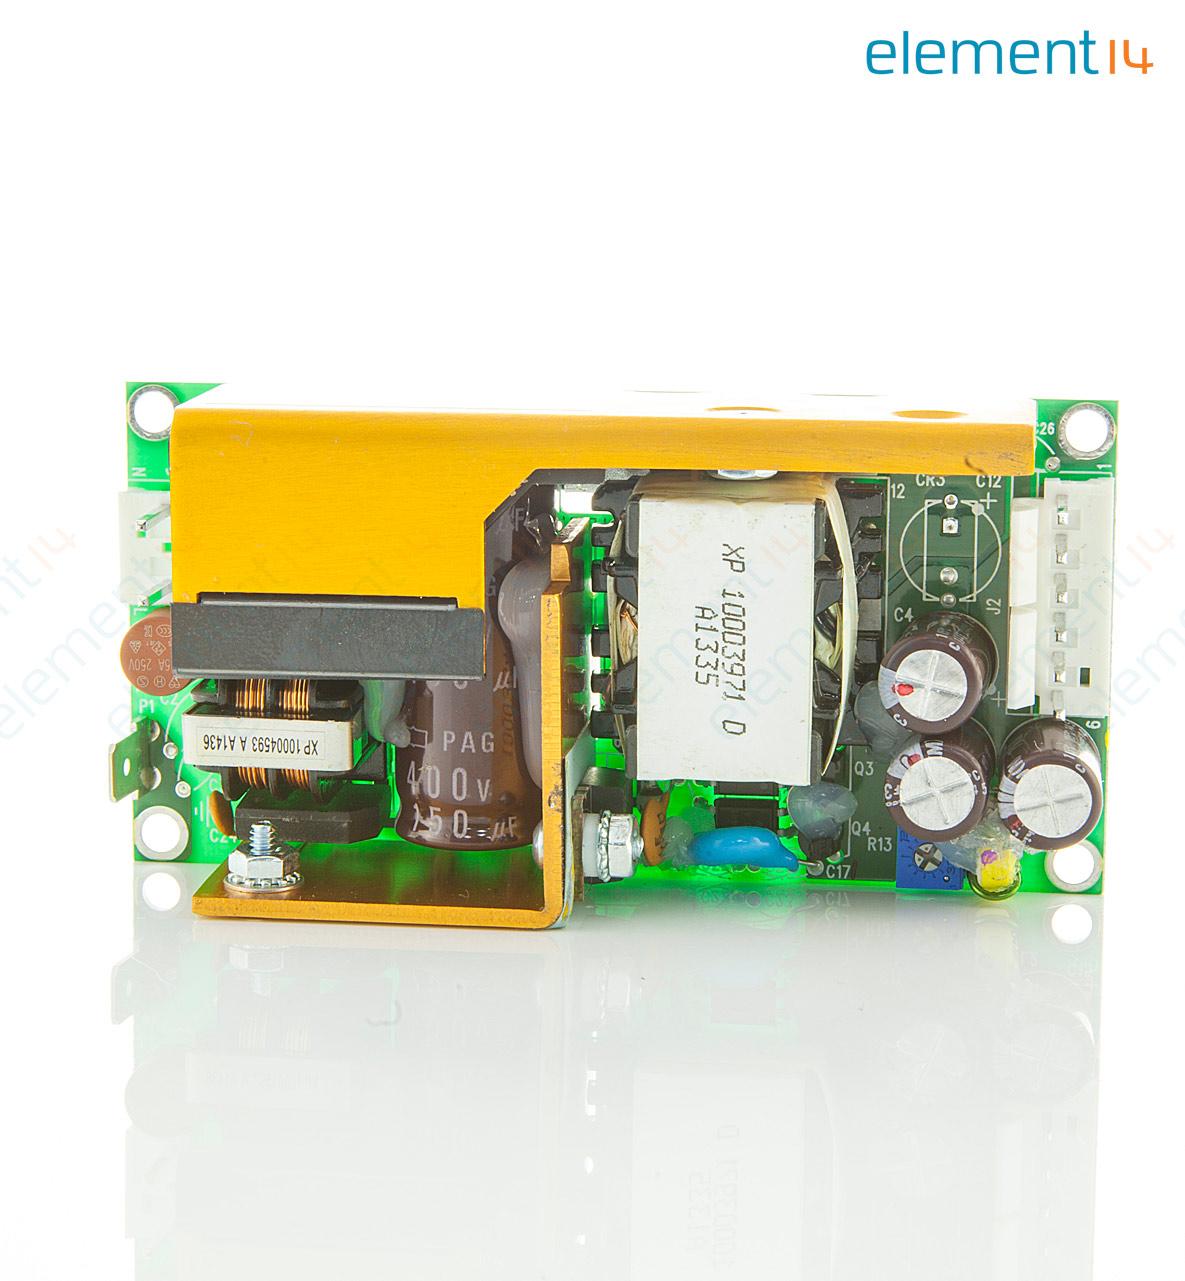 Ecm40us05 Xp Power Ac Dc Open Frame Supply Psu Ite 01v To 50v Variable